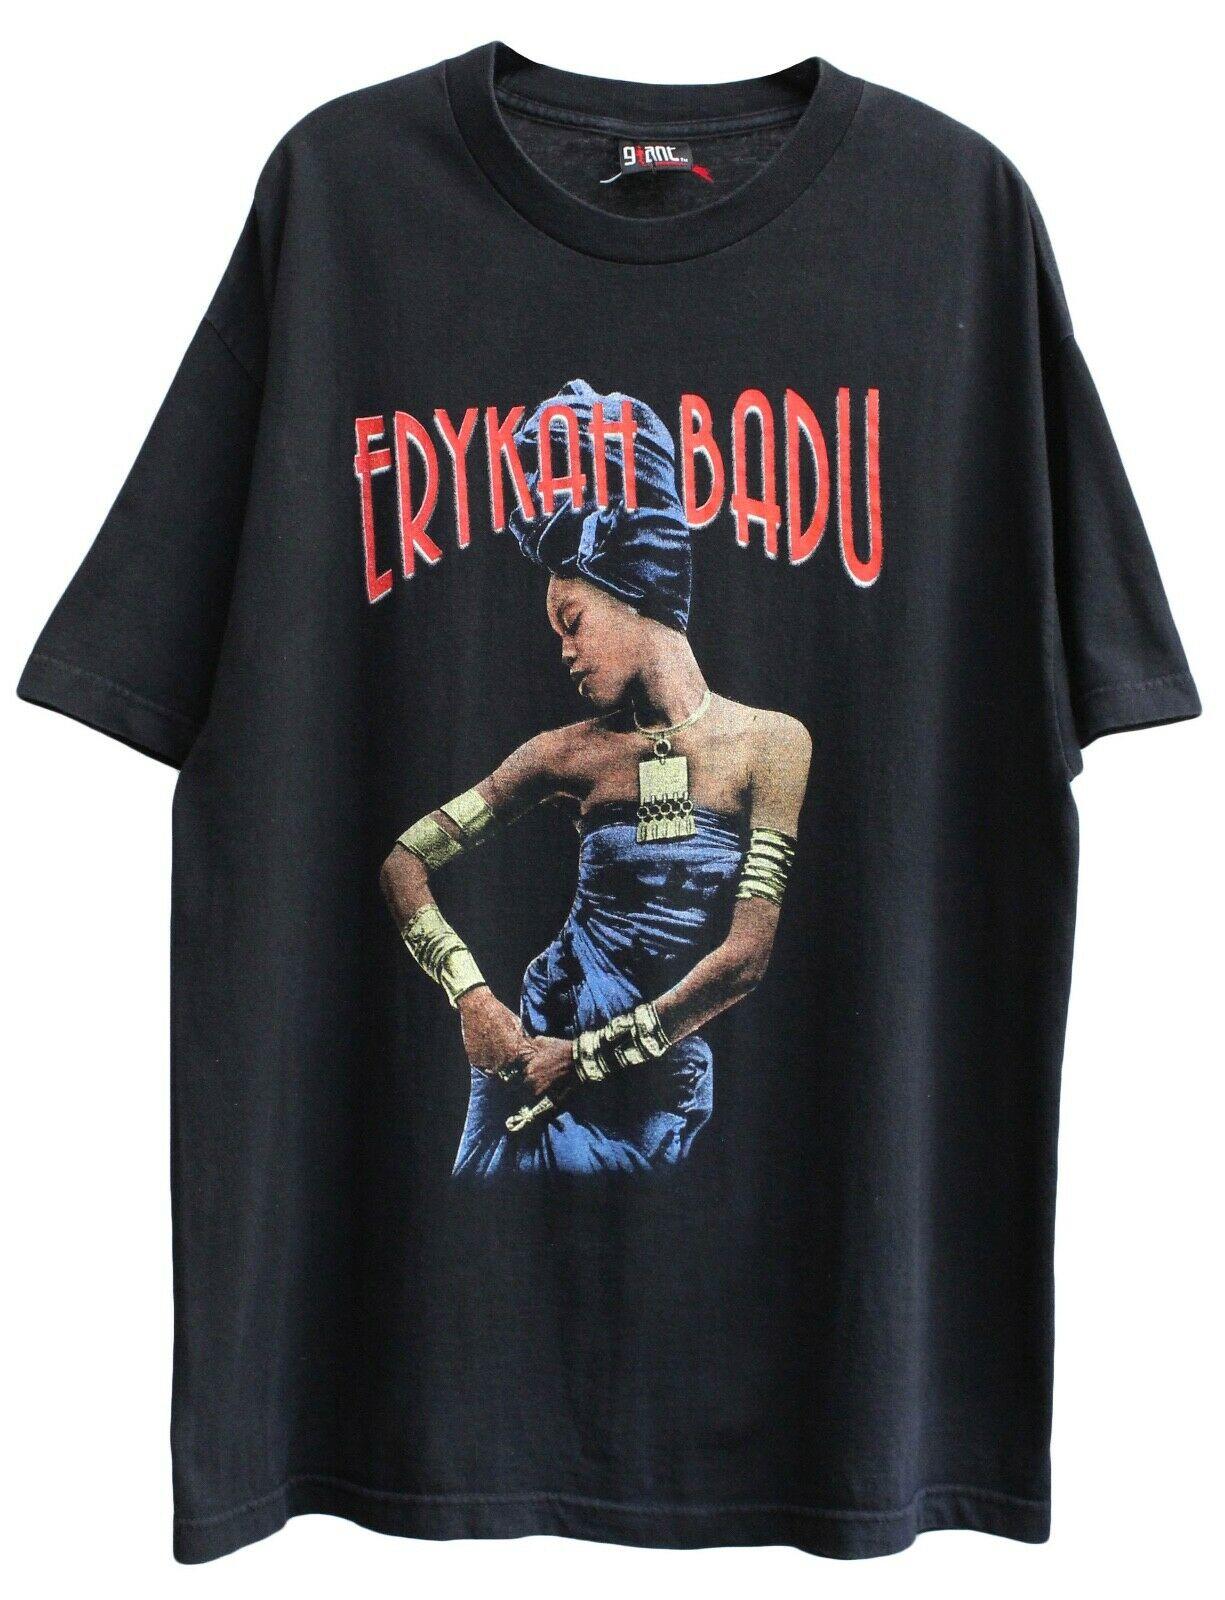 Erykah Badu Mamas Gun Tour Shirt 2001 Lauryn Hill Rap Tee Sade Selena Vtg